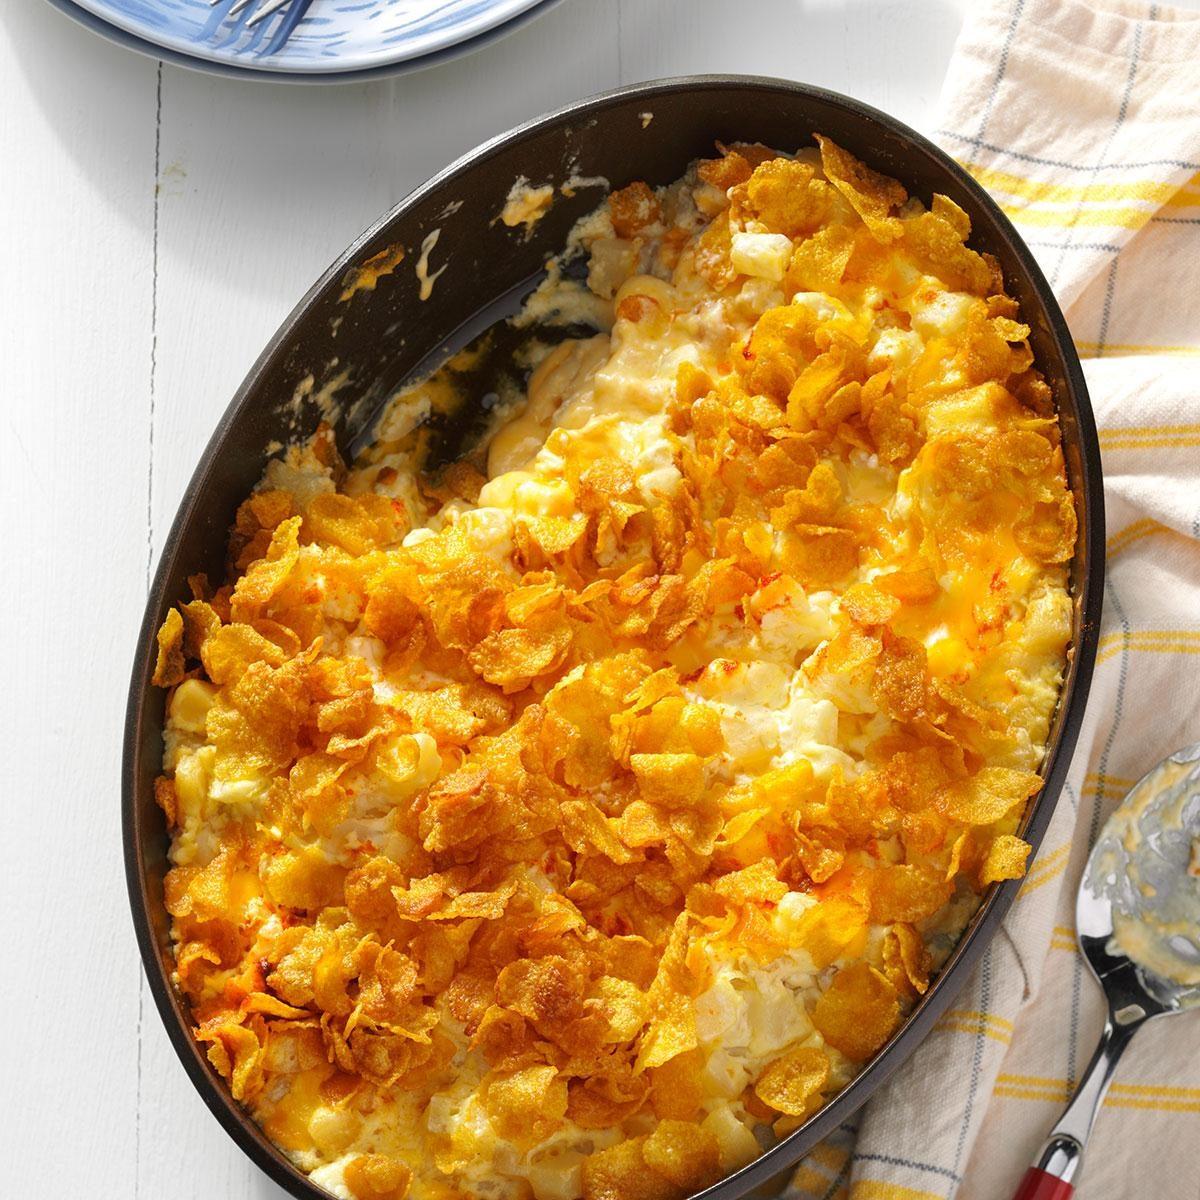 Oklahoma: Creamy Hash Brown Casserole